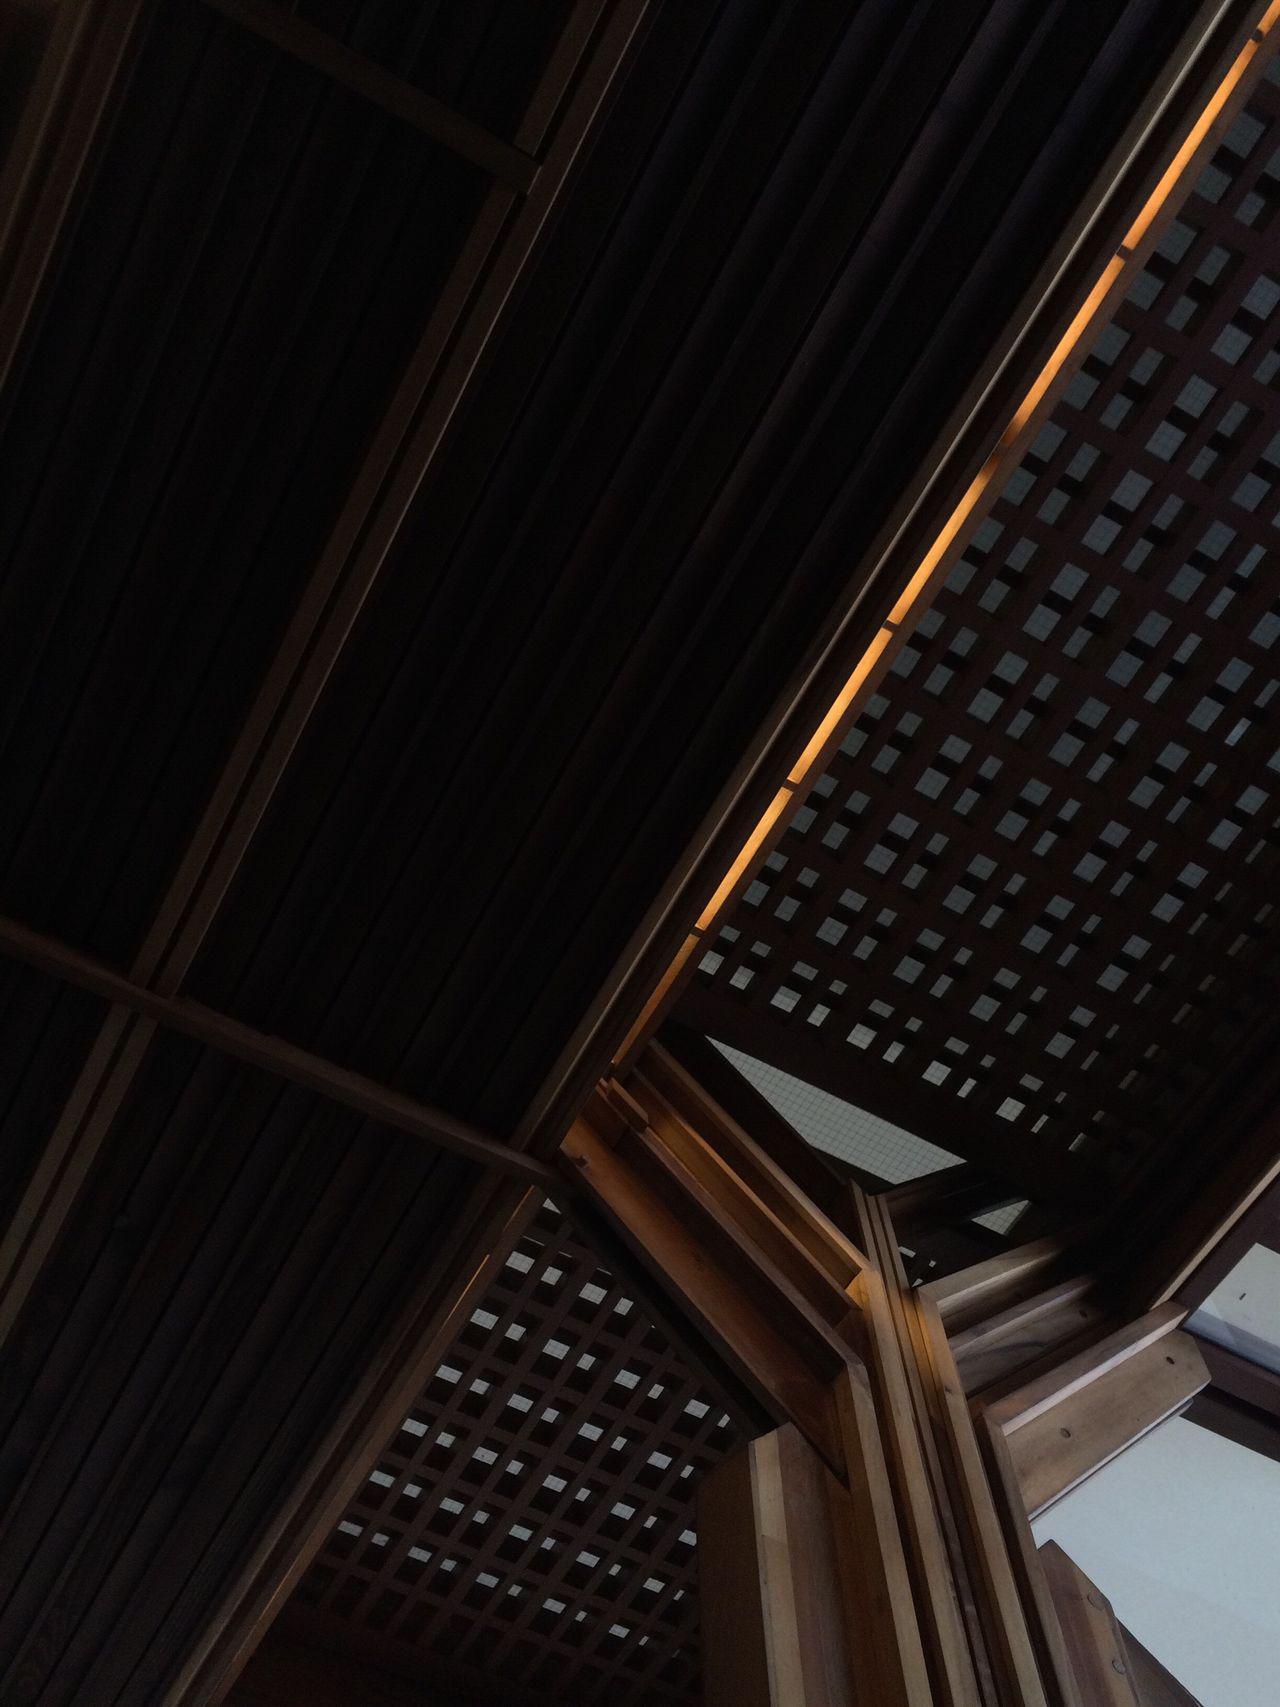 Boiserie Carloscarpa Venezia Cafoscari Wood - Material Interior Design Design Architecture No People Minimalism Diagonal Lines Leading Lines